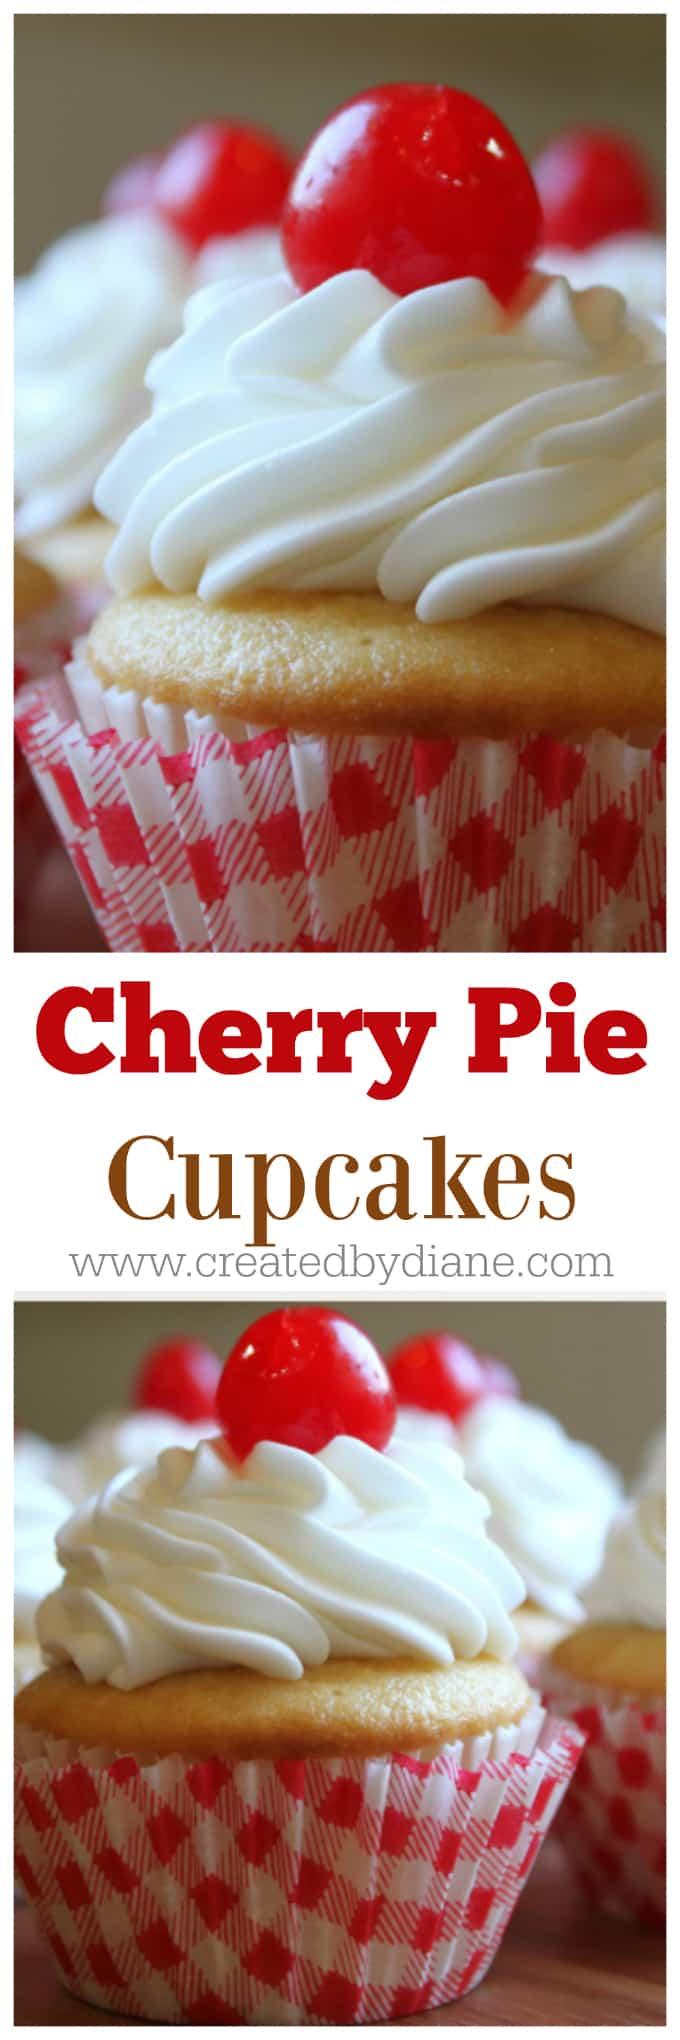 cherry pie cupcakes www.createdbydiane #cupcakes #cherrypie #fruit #fruitfilling